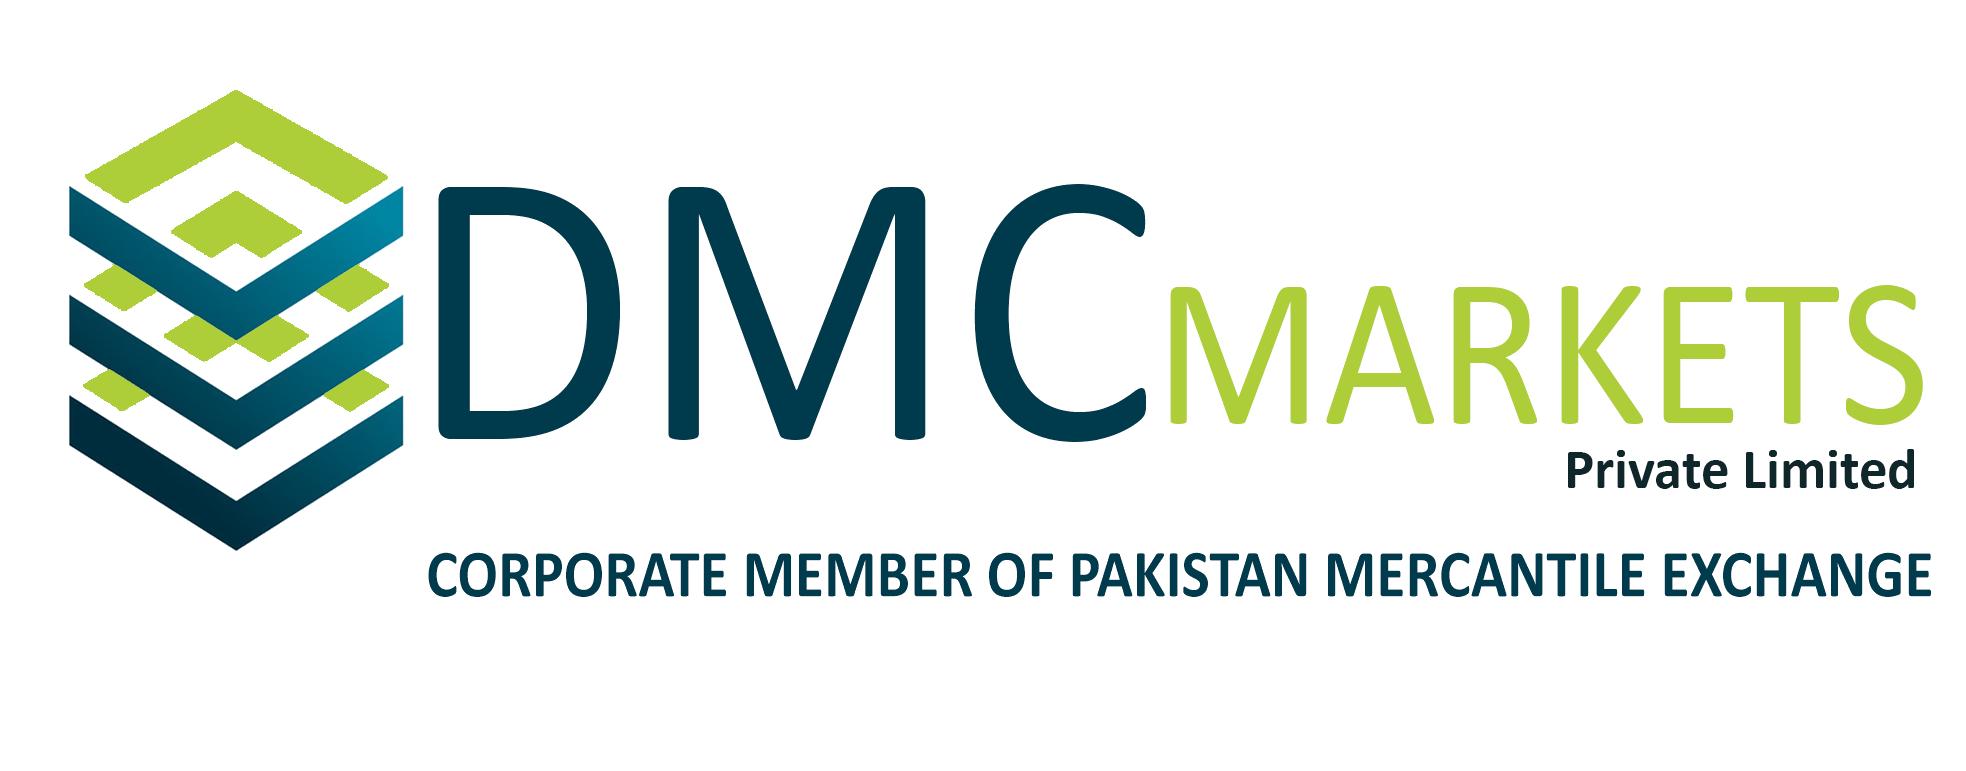 http://www.pakpositions.com/company/dmc-markets-pvt-ltd